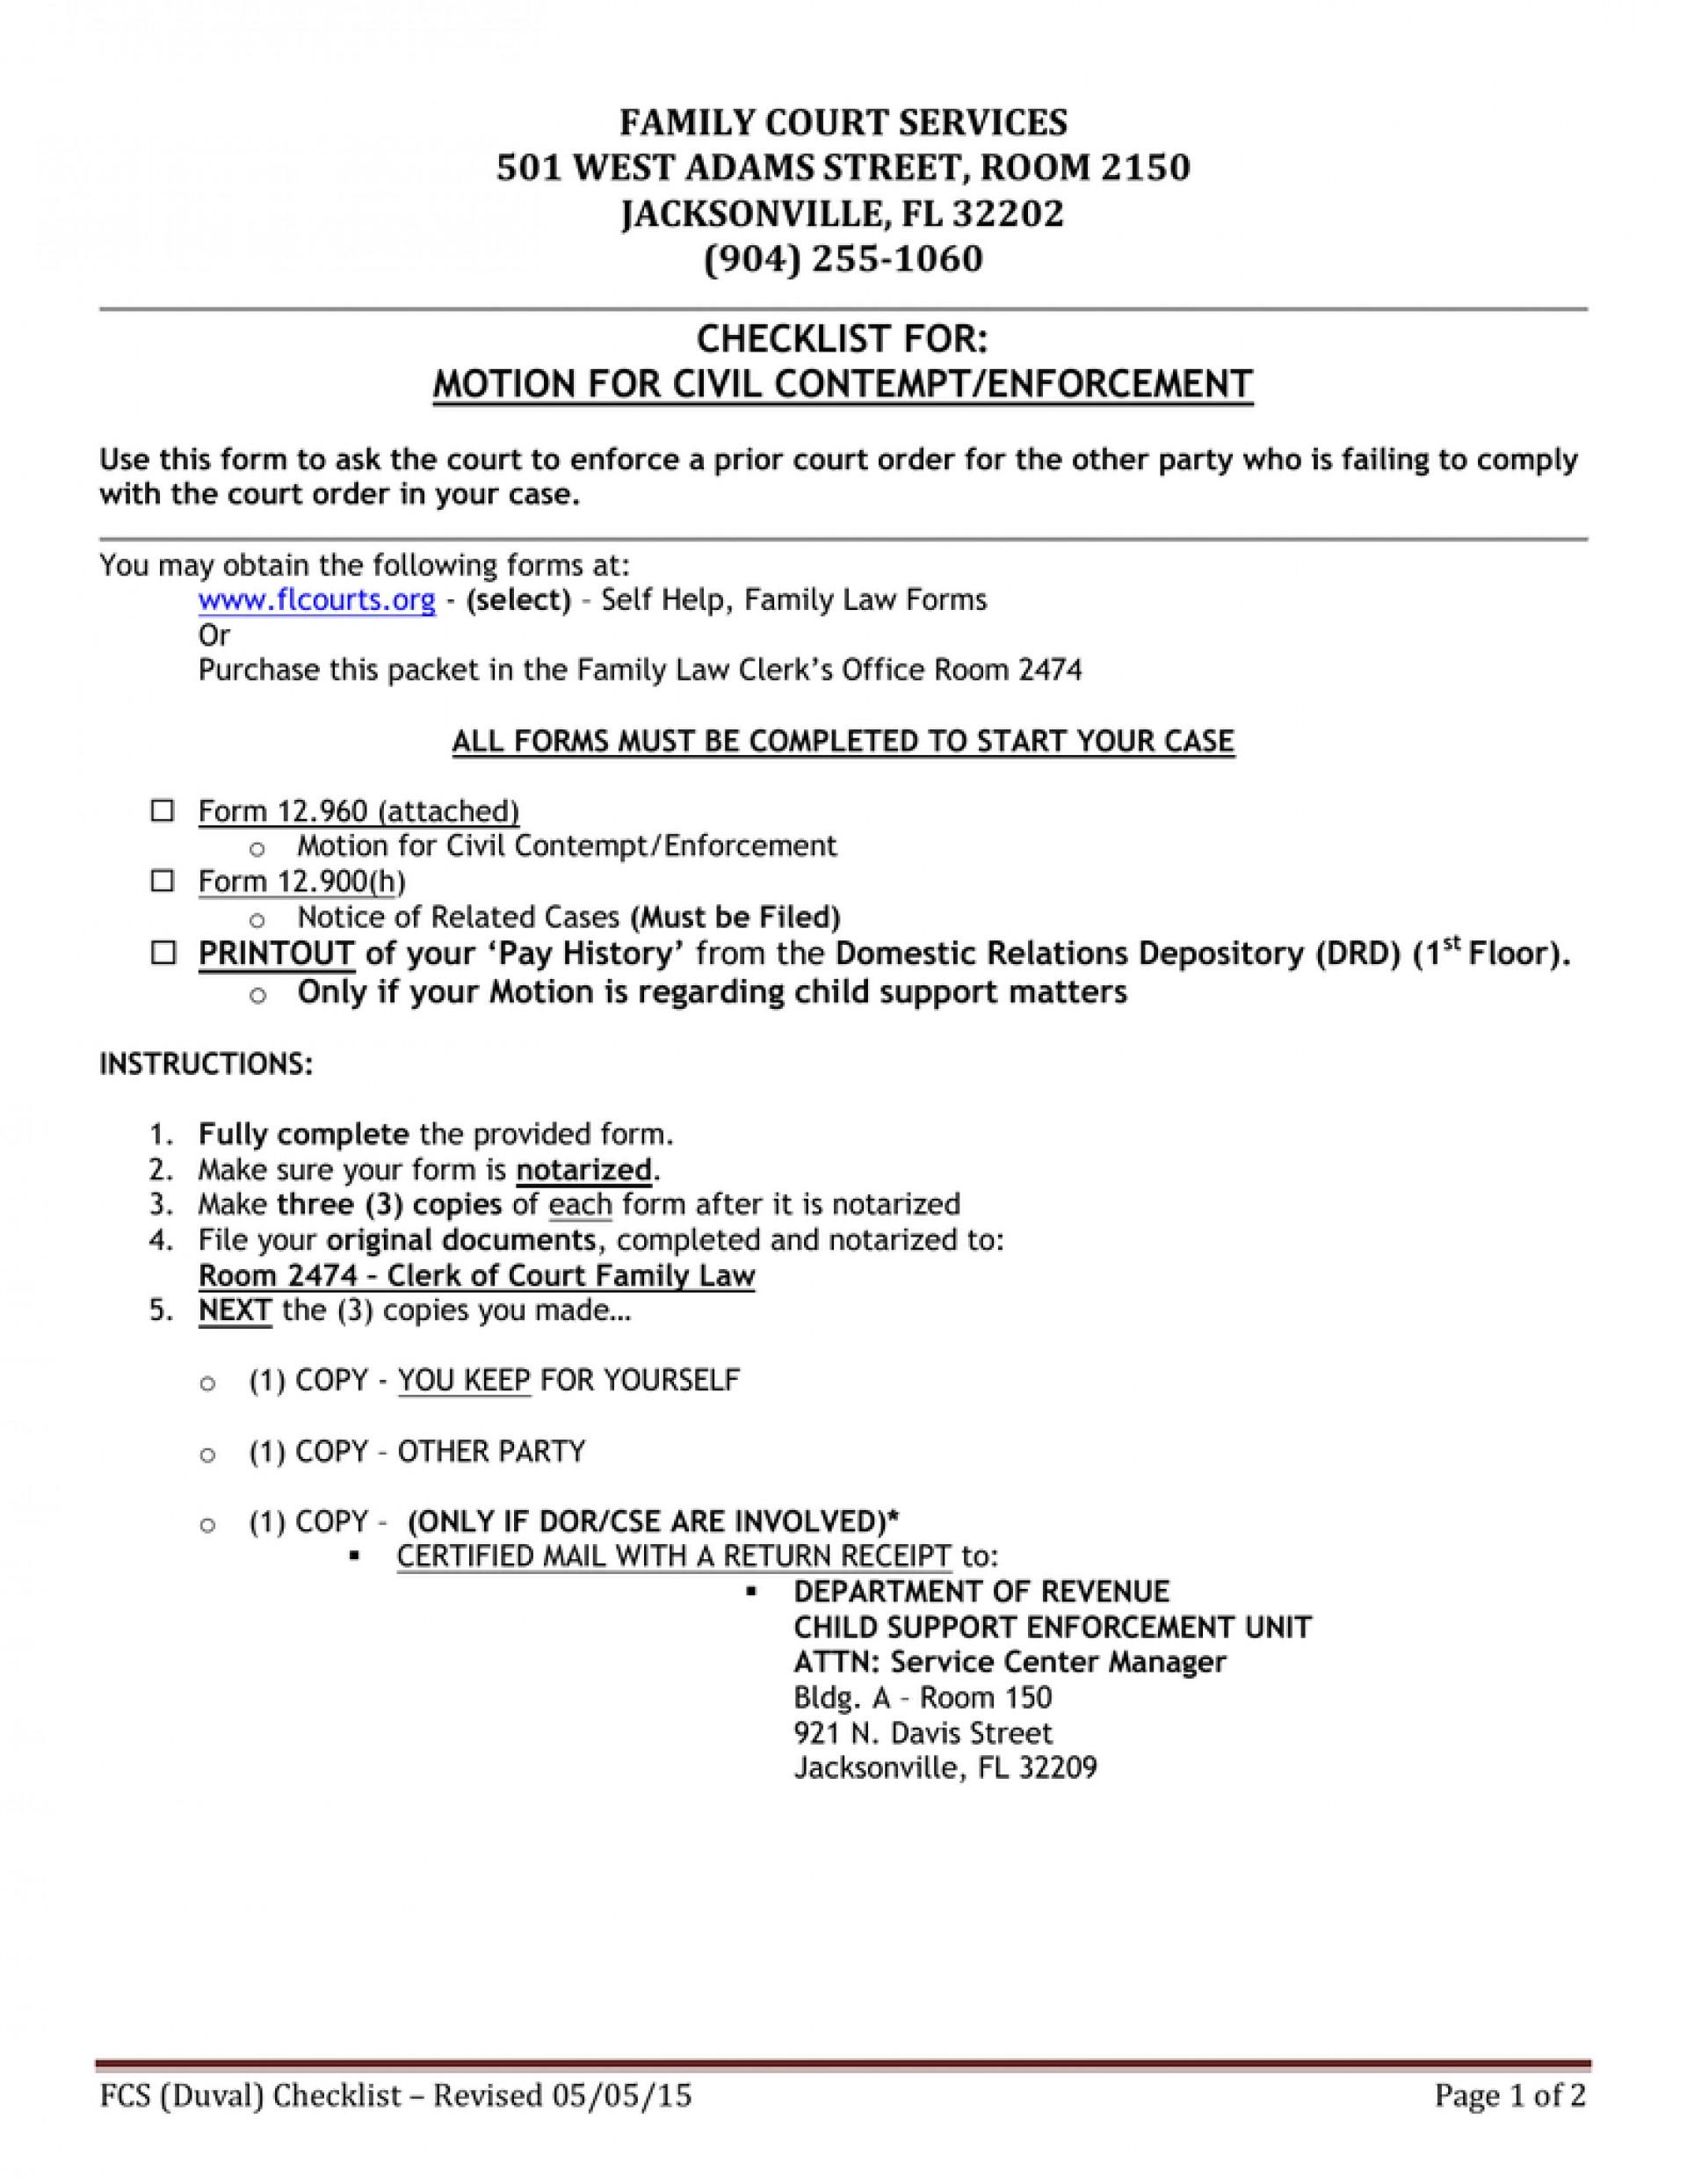 Florida Financial Affidavit Excel Spreadsheet Spreadshee Florida Financial Affidavit